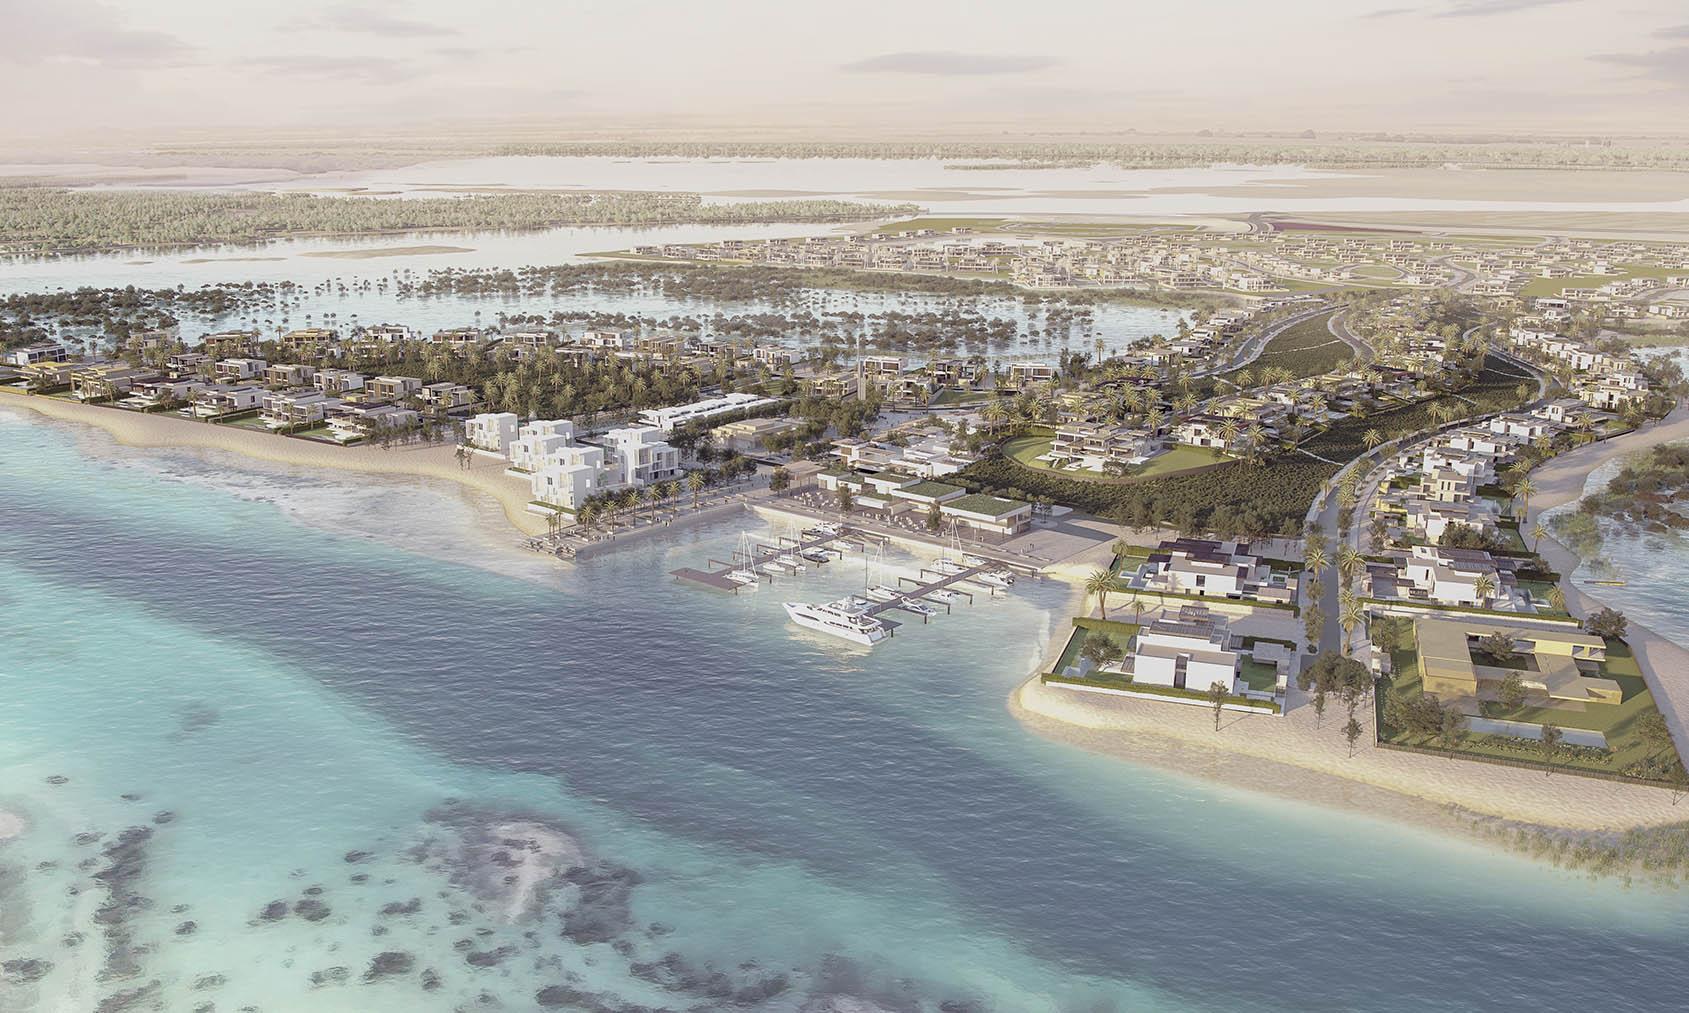 Megaproyecto de lujo de Ramón Esteve en una isla de Abu Dabi El Periòdic d'Ontinyent